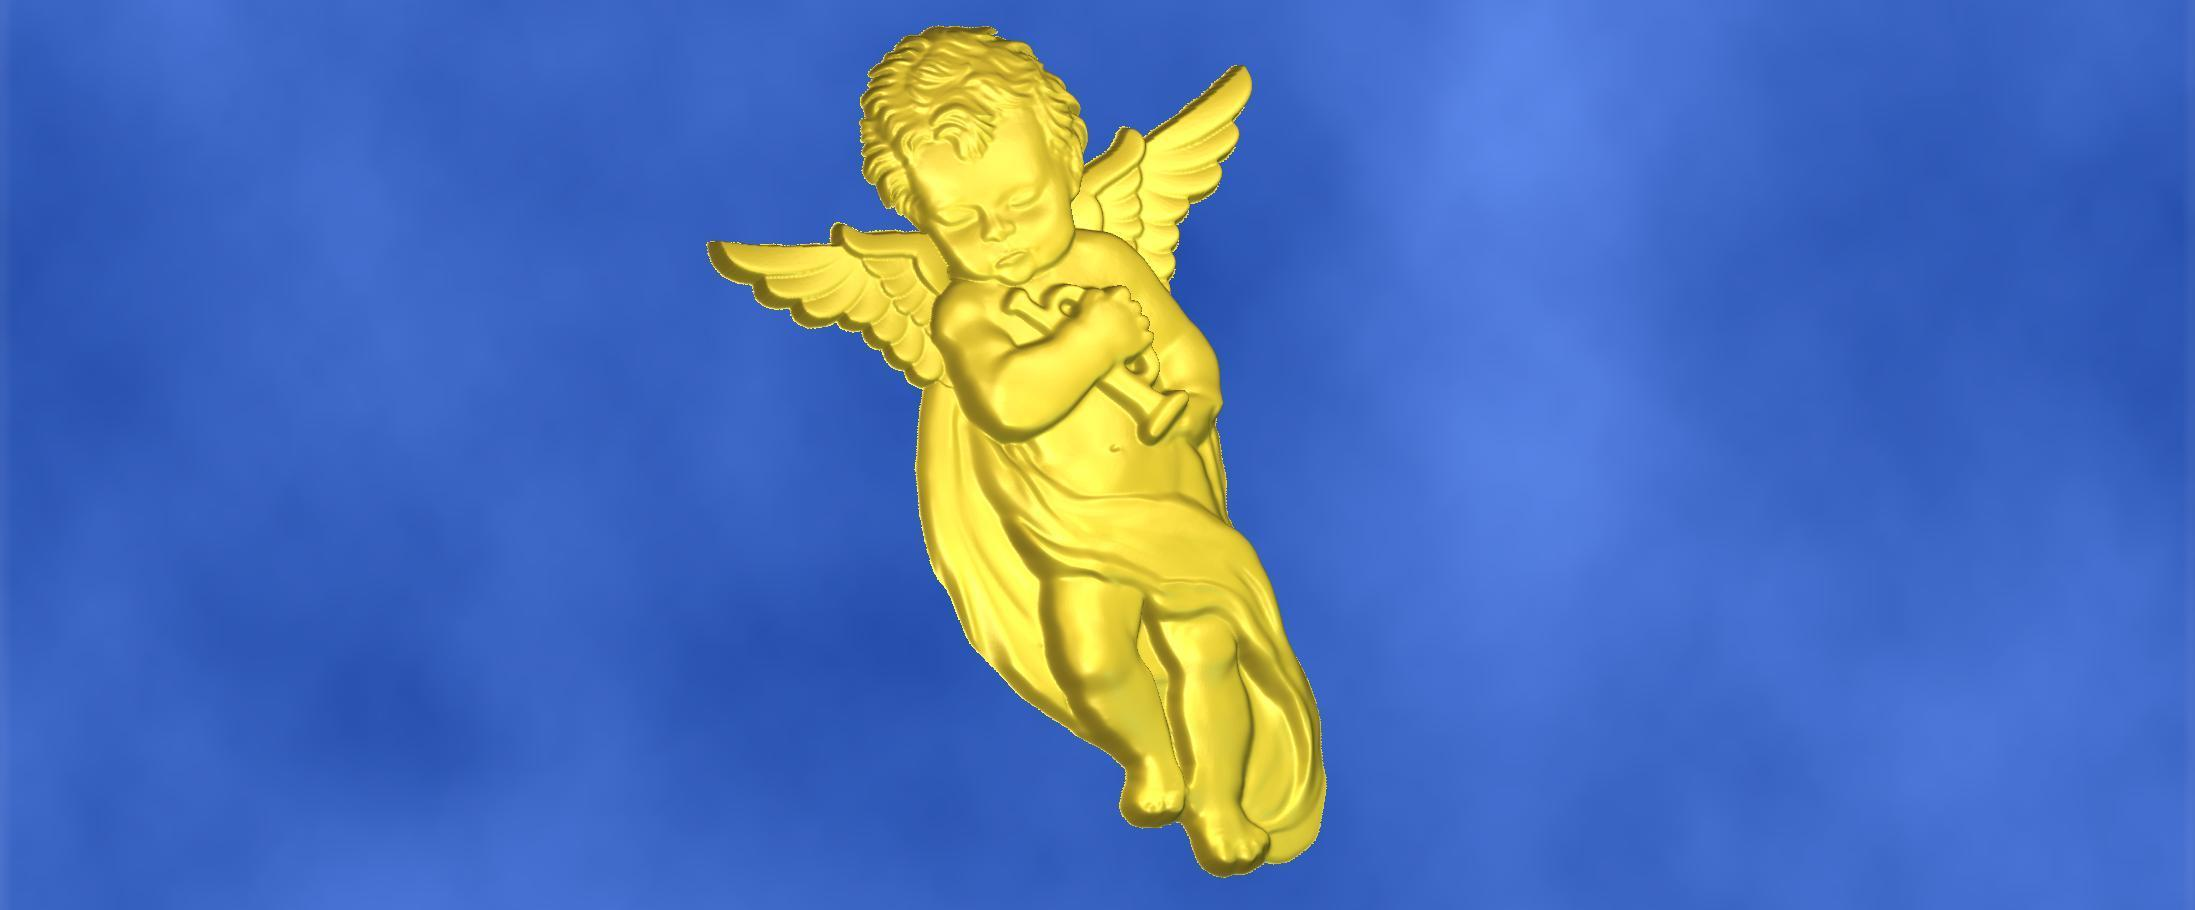 8.jpg Download free STL file 3D STL MODEL CHERUB  • 3D print model, ALPHA_MENA